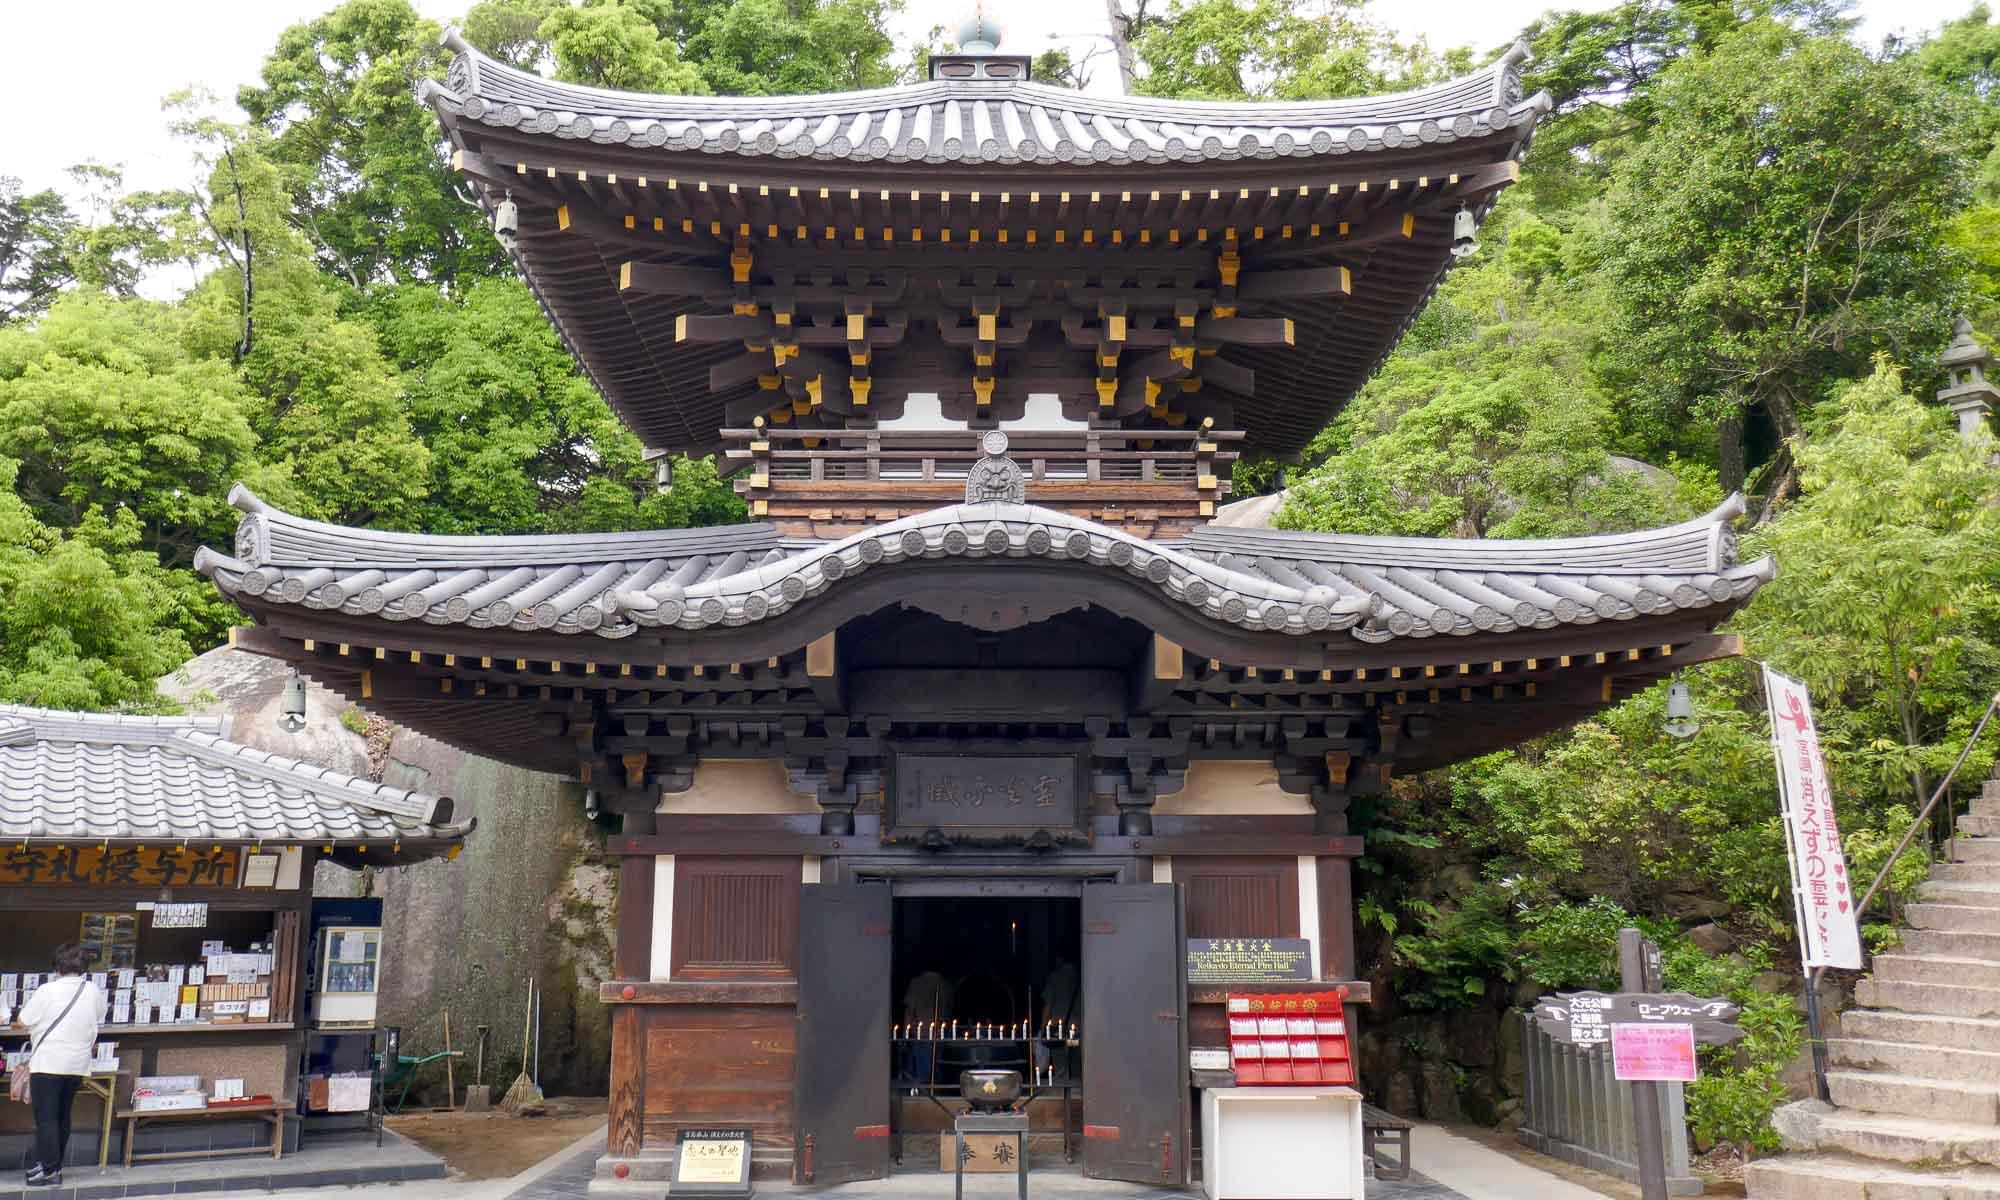 Reikado Hall (Eternal Fire Hall) on Mount Misen